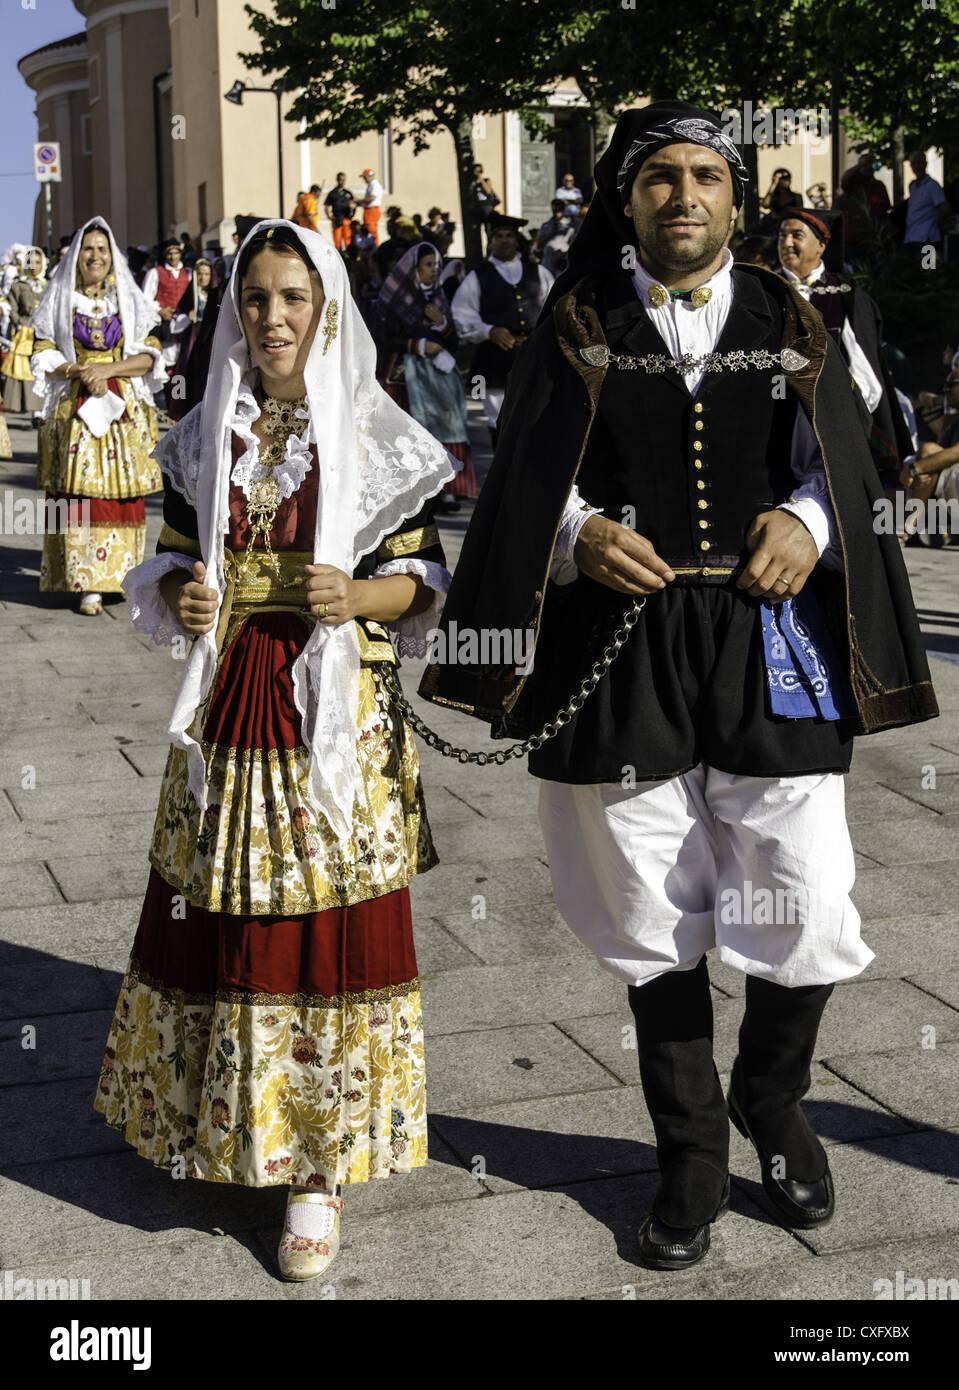 Italien frauen dating